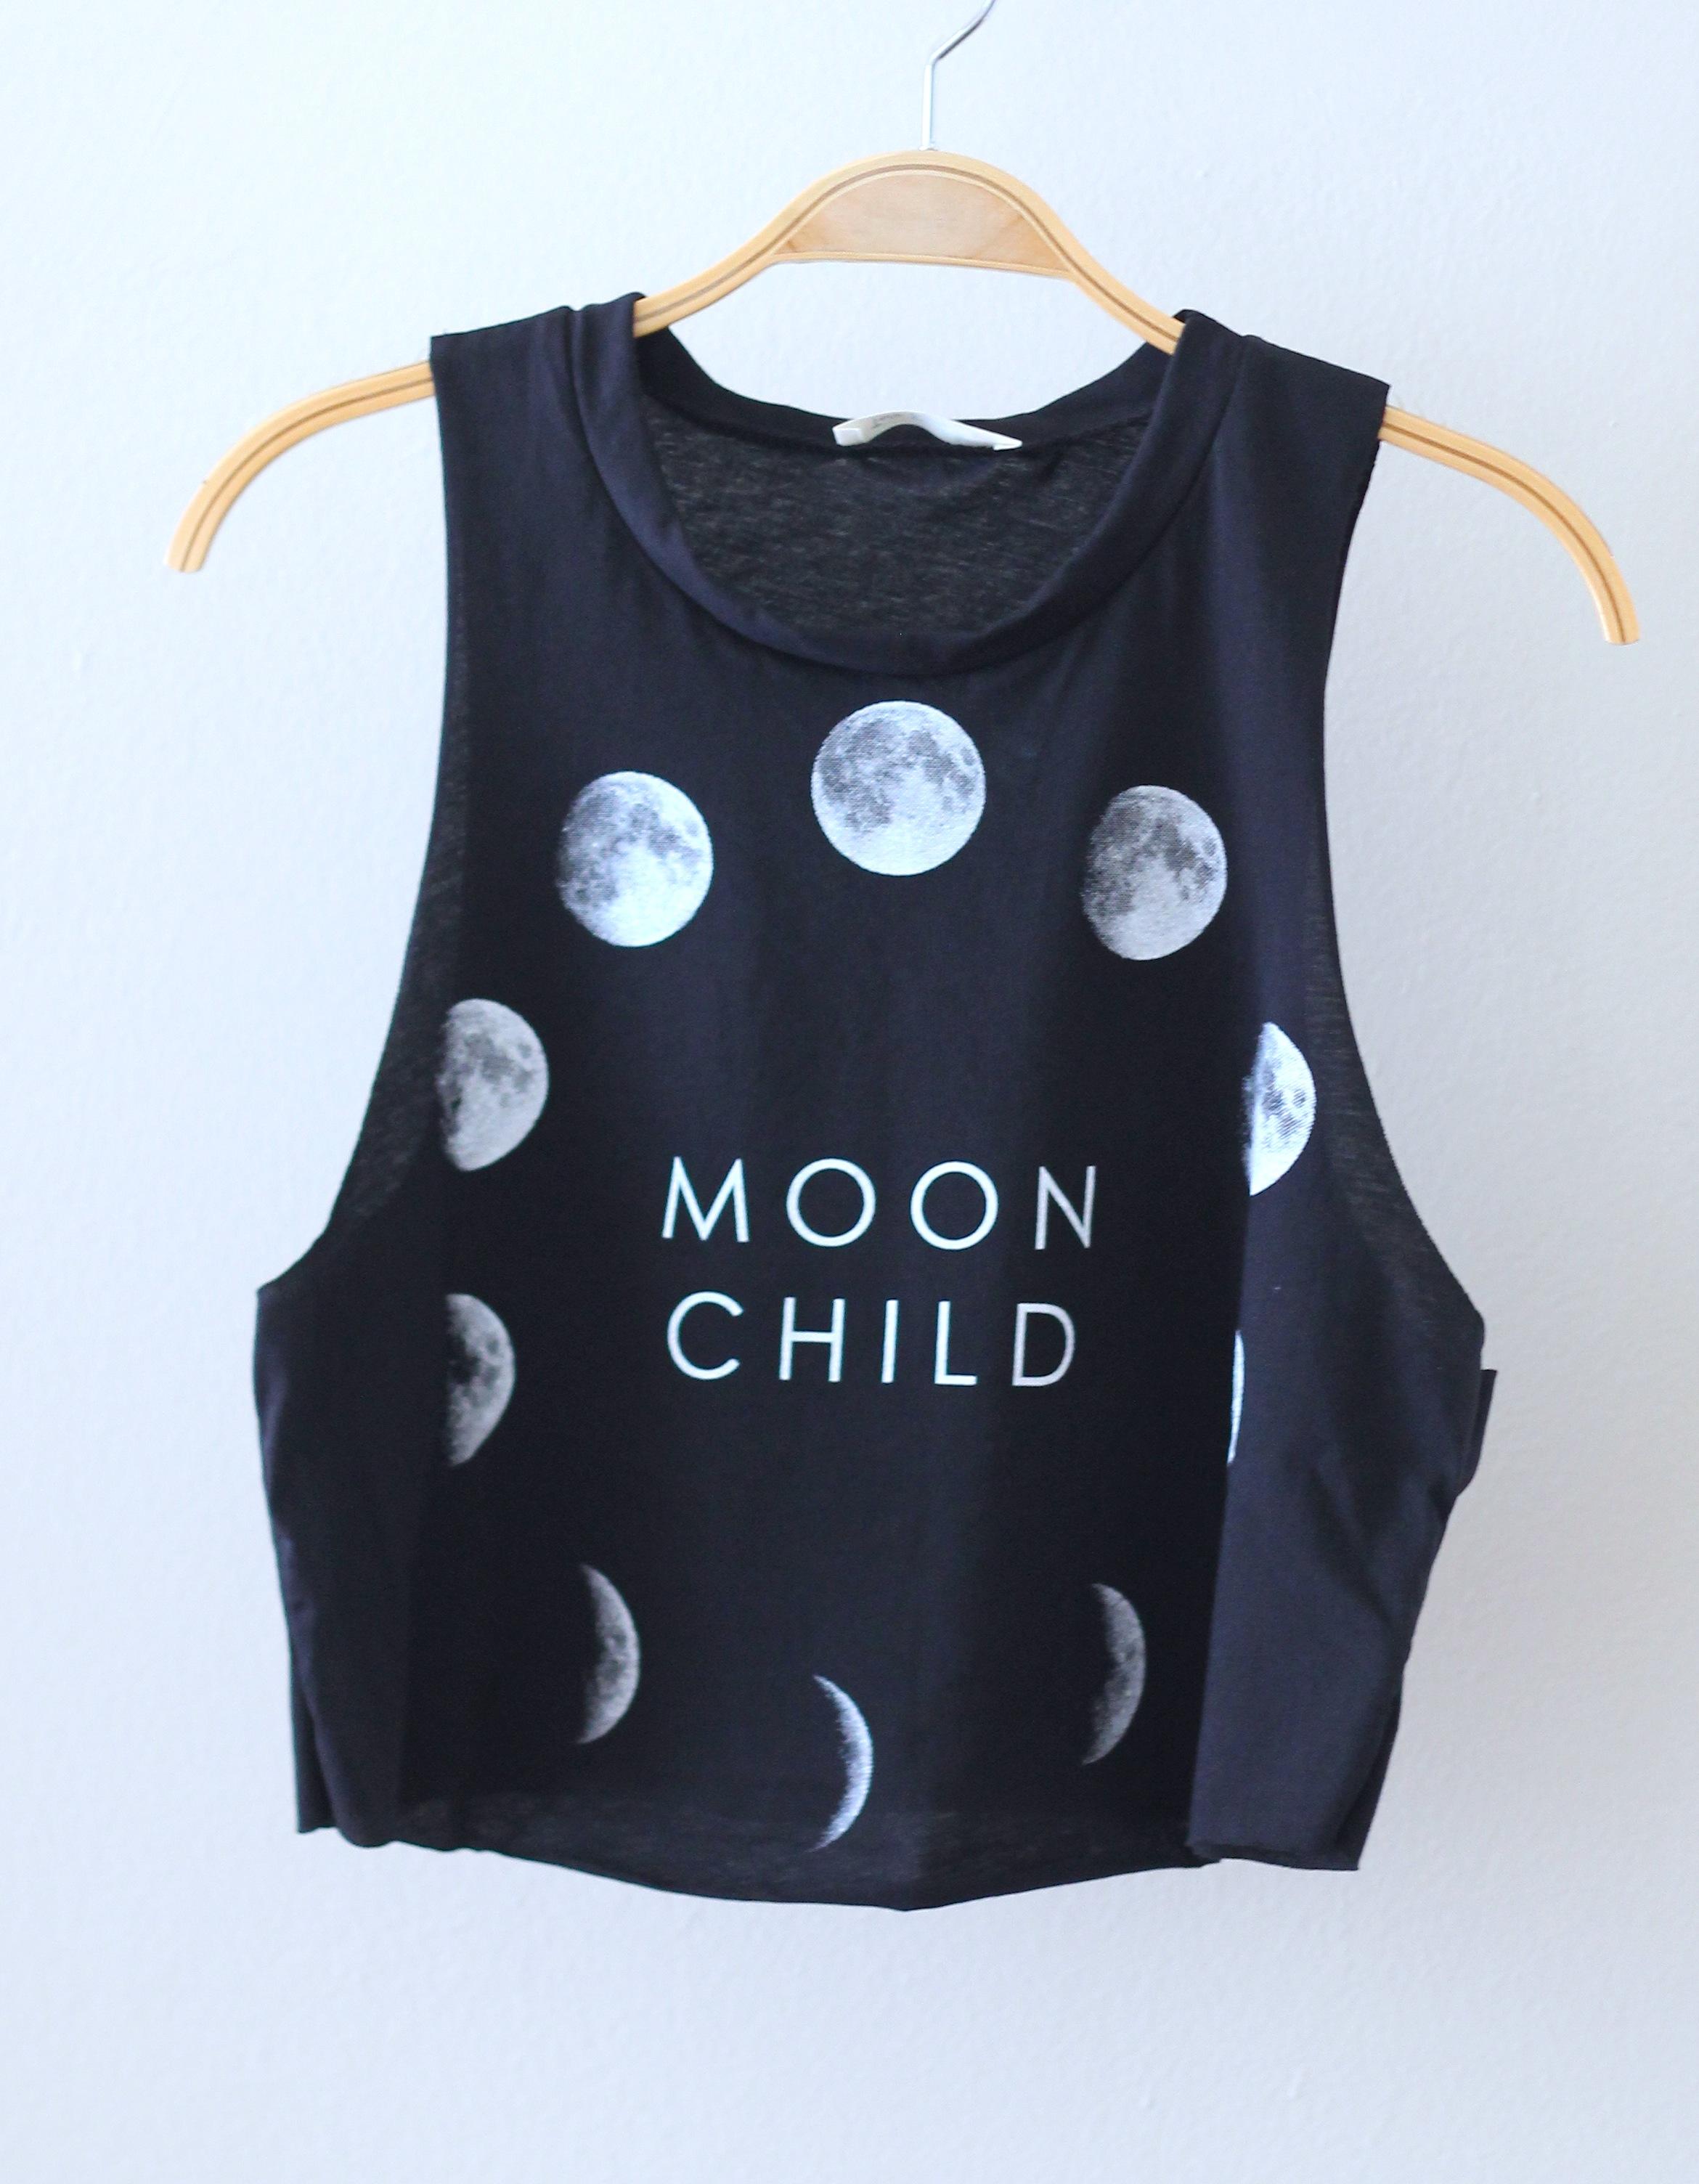 Moon child ii crop tank from love junkee on storenvy